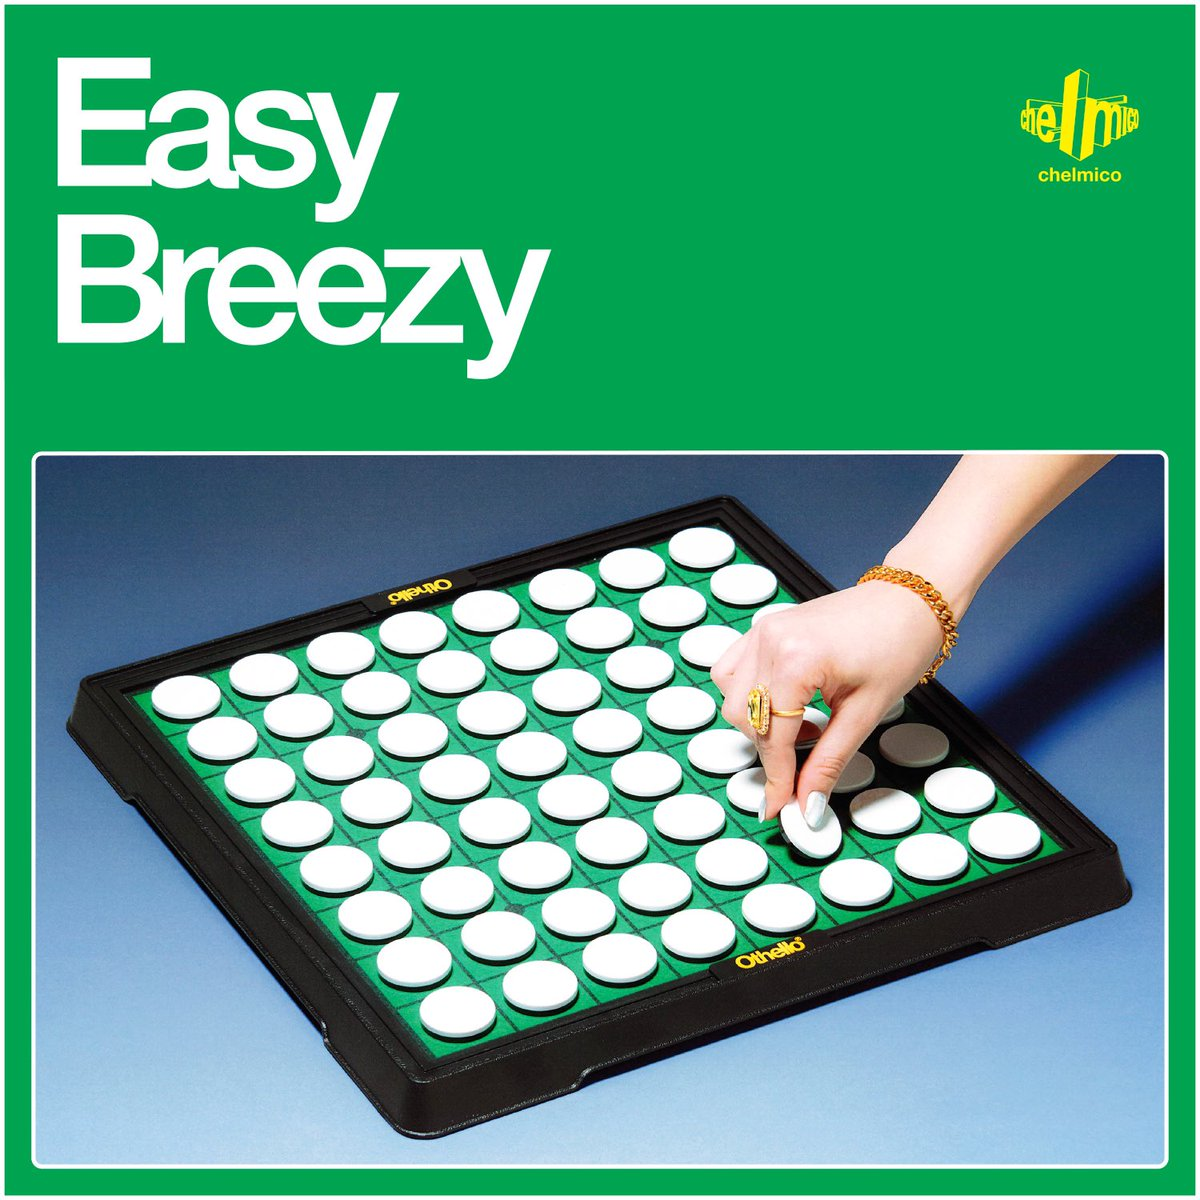 ❣️お知らせ❣️chelmico「Easy Breezy」iTunesで予約注文受付中🙏🔥🙏配信スタートは1/17(金)です🙇♀️🙇♀️iTunes Store👉👉